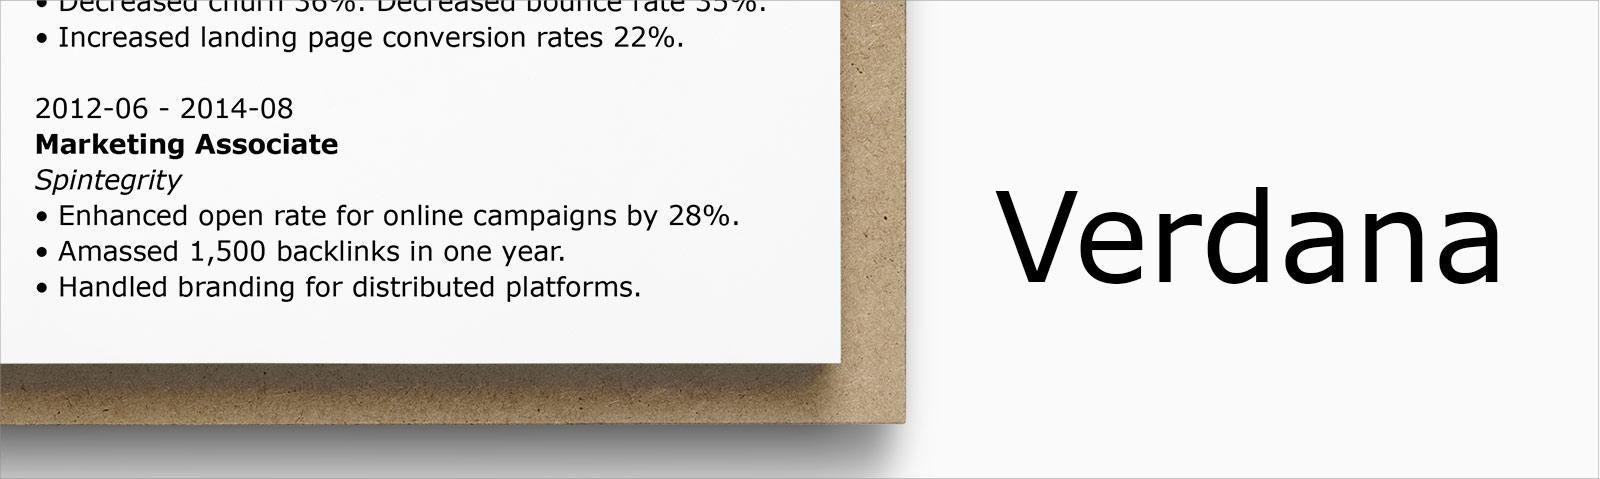 Matthew Carter created Verdana for Microsoft as the sans